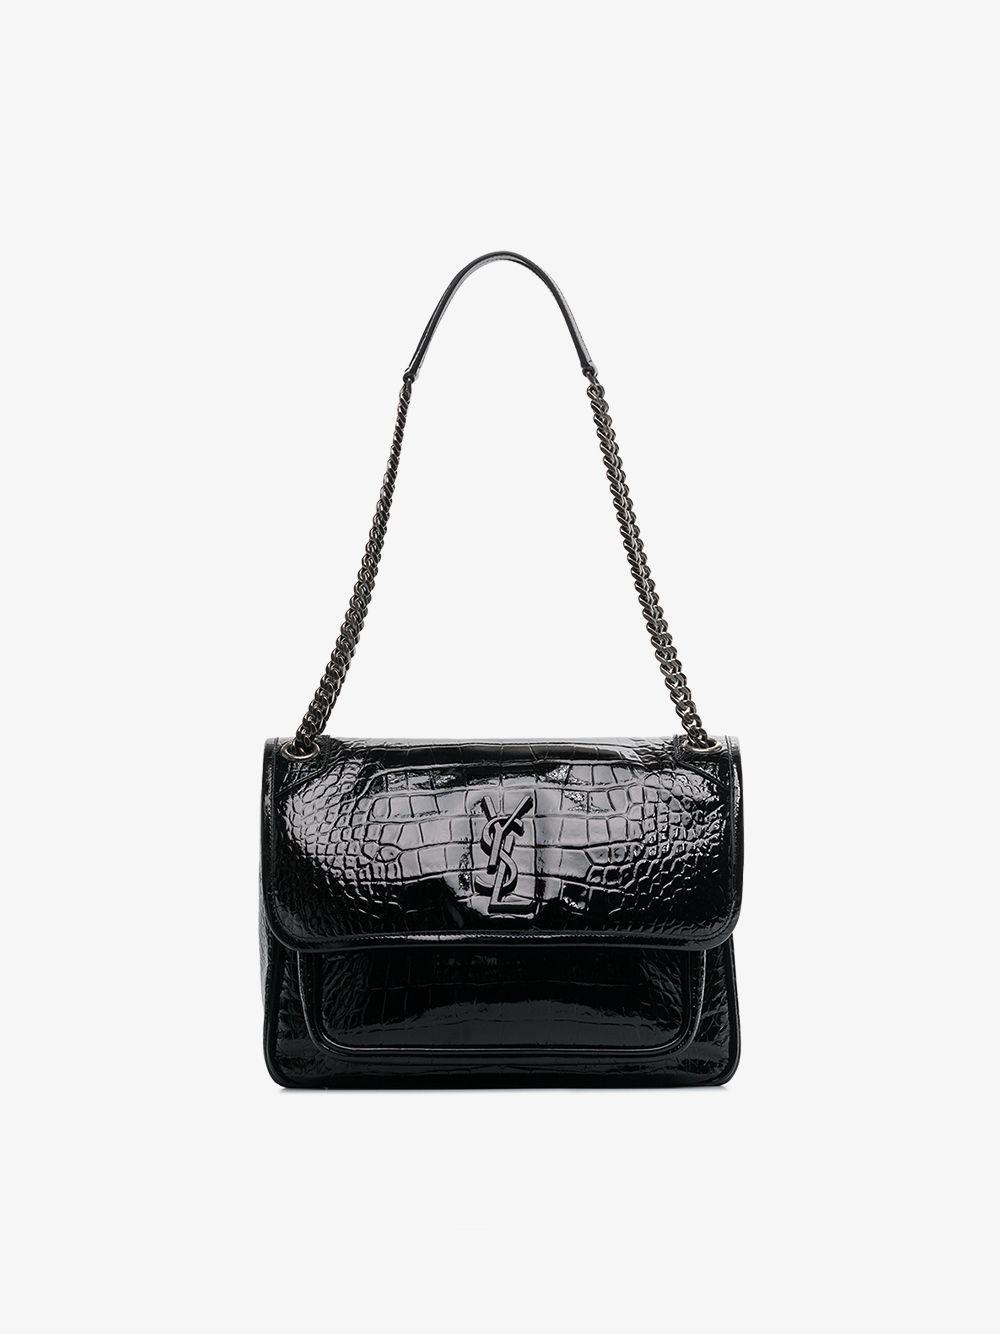 ee56fc0a3cab Saint Laurent - Black Monogram Niki Leather Shoulder Bag - Lyst. View  fullscreen